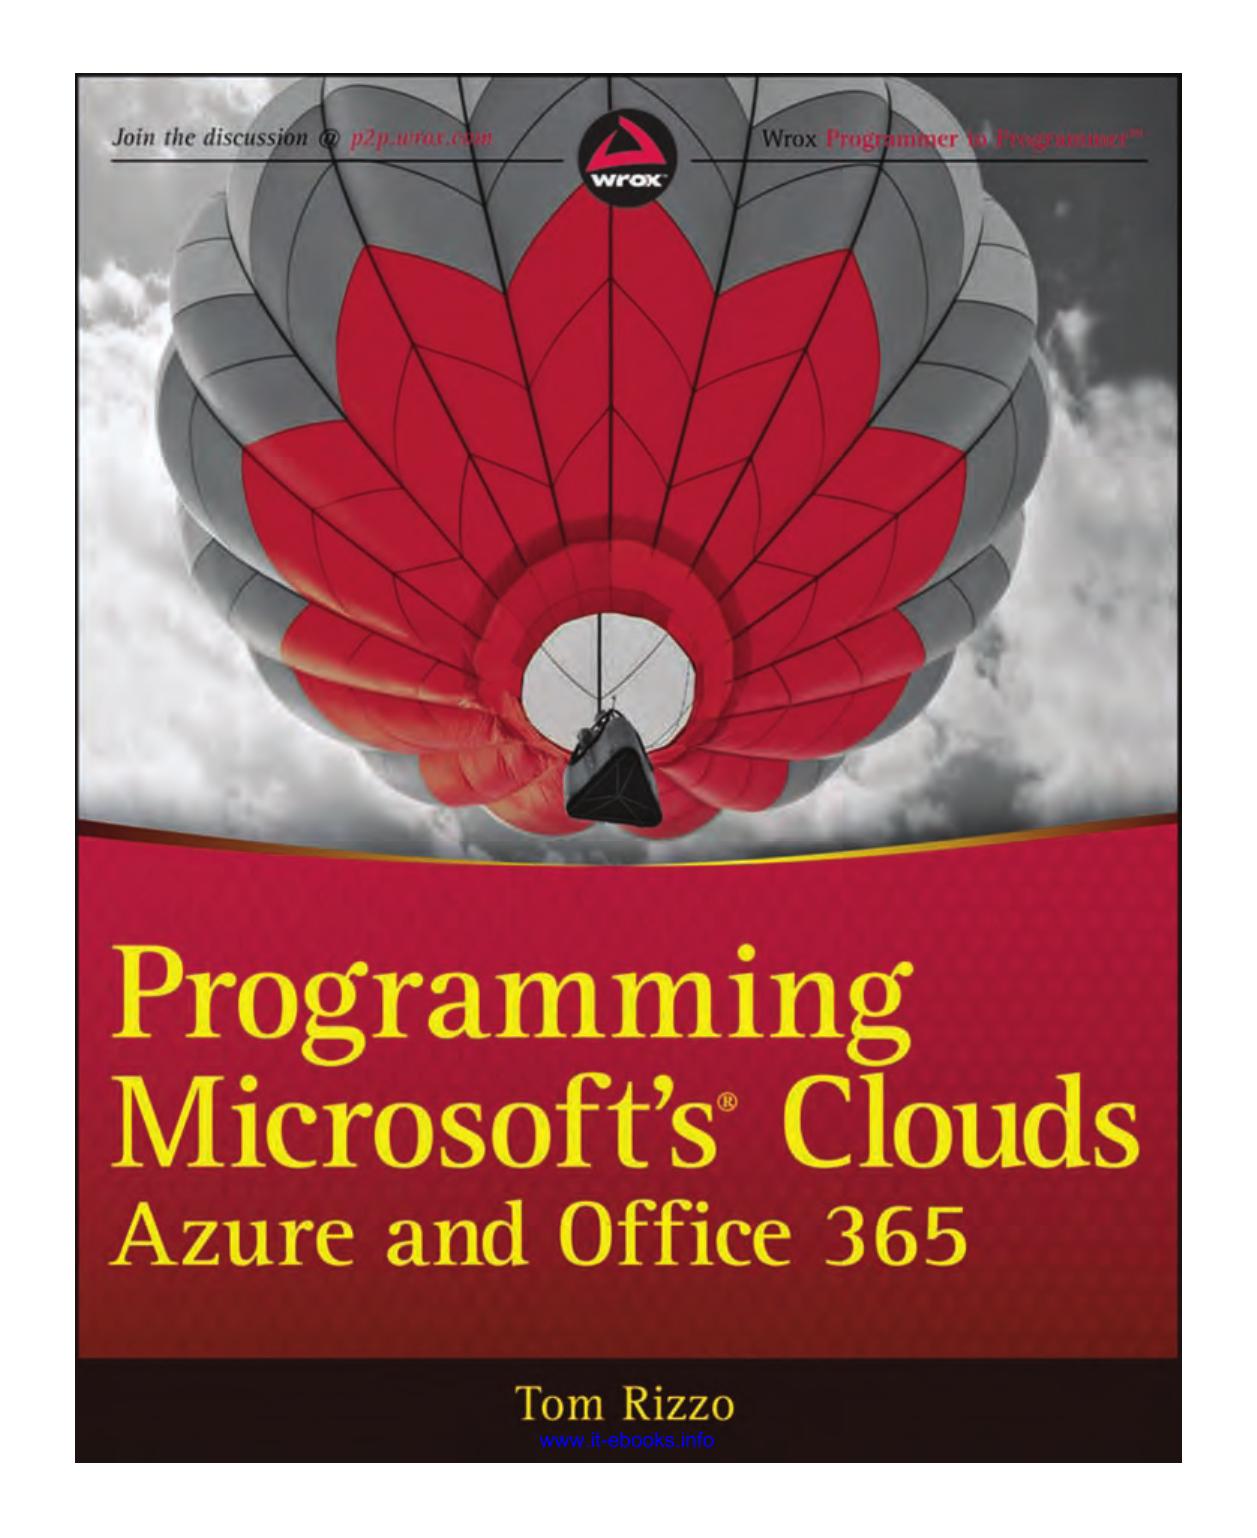 Programming Microsoft`s Clouds | manualzz com